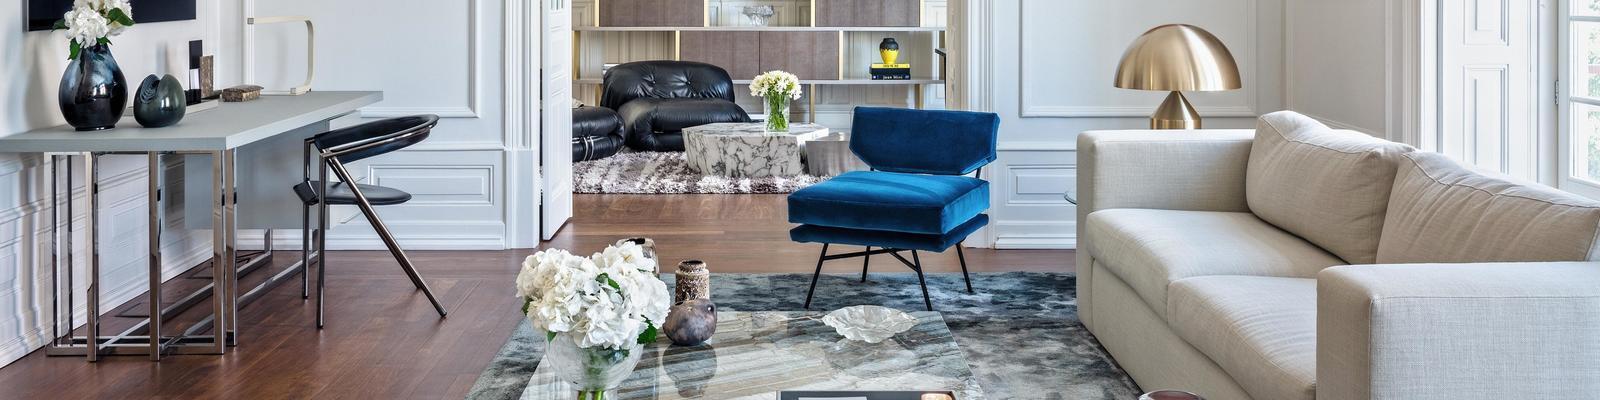 Cristina Jorge de Carvalho Furniture Collection background